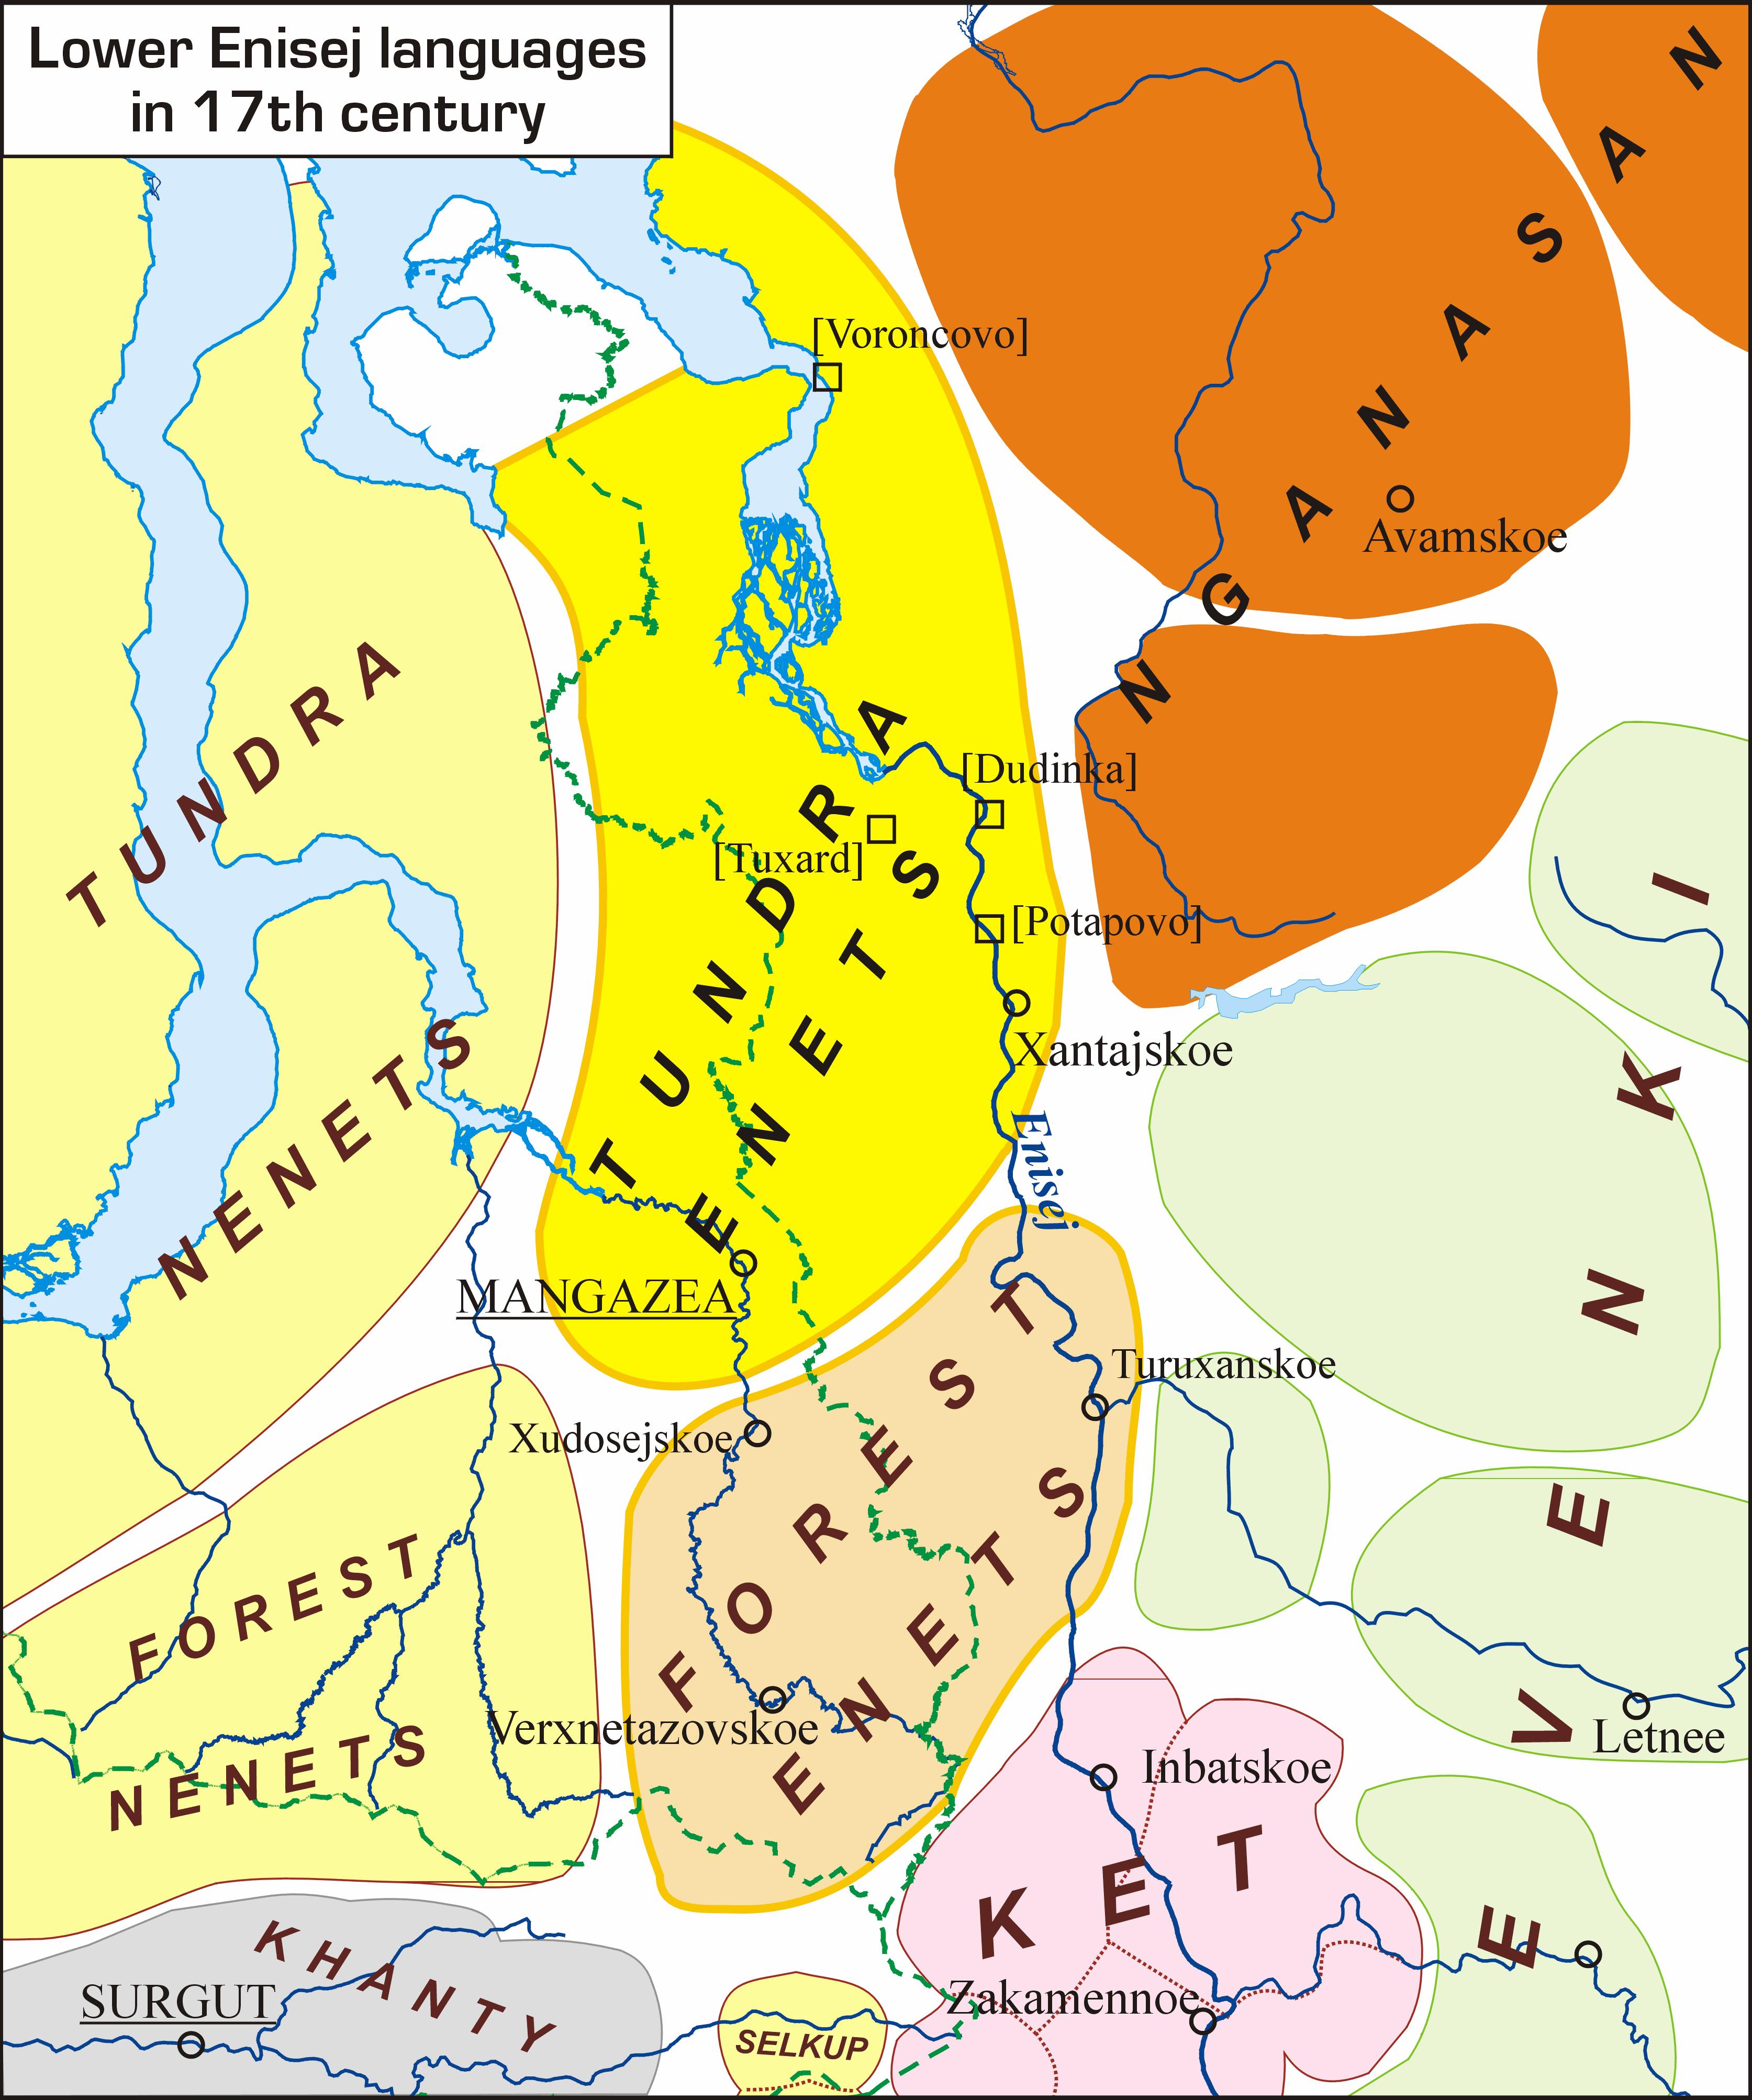 Languages of Lower Enisej and adjacent areas (17th century); авторы Ю.Б.Коряков, О.В.Ханина